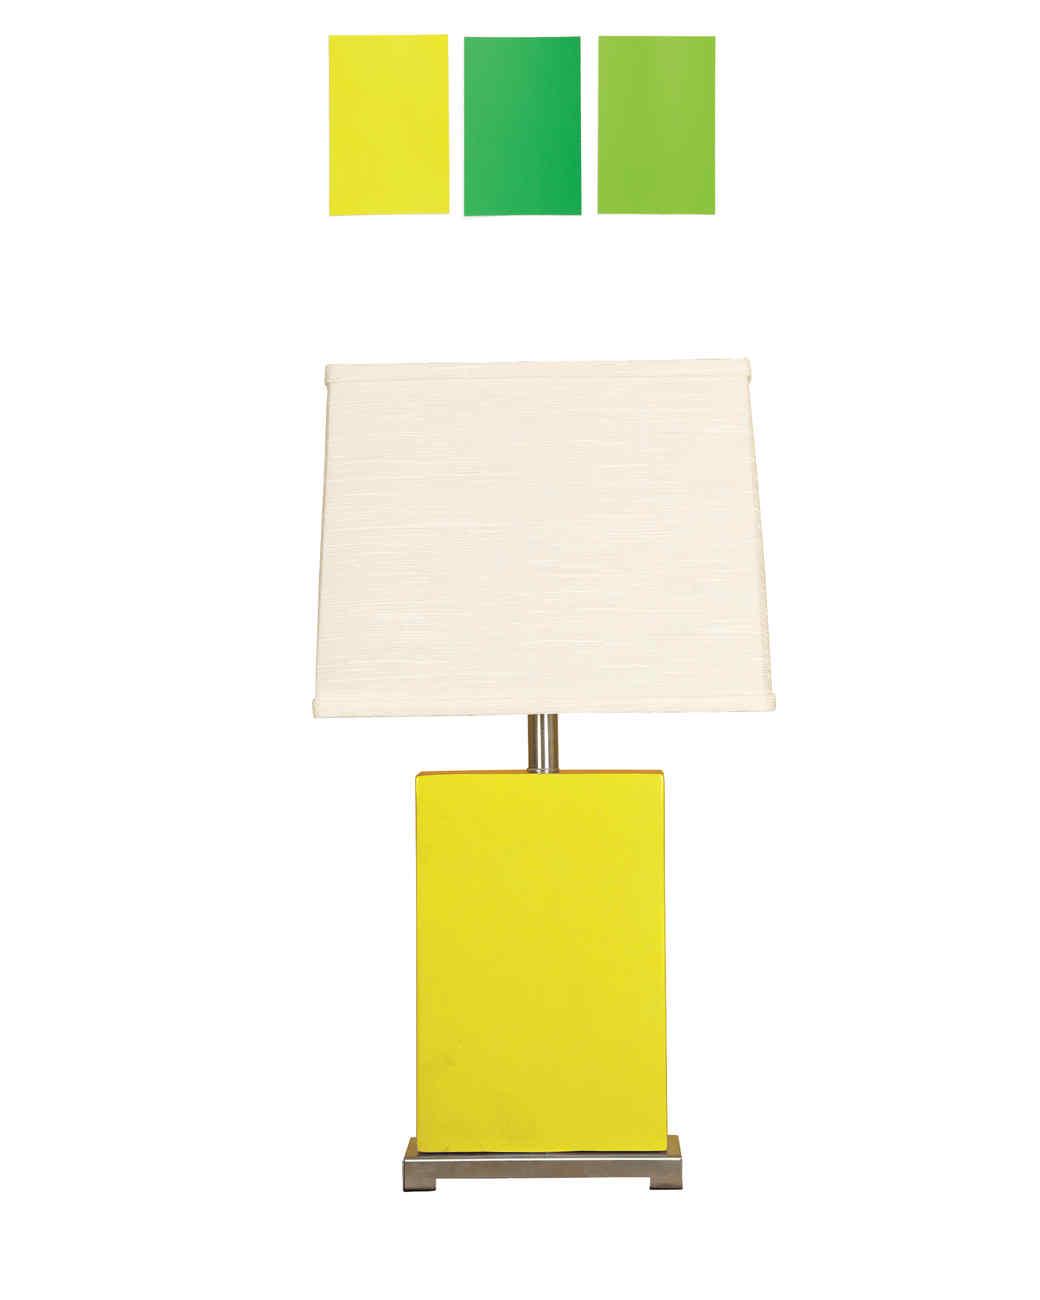 colorblocked-block-table-lamp-ms108570.jpg